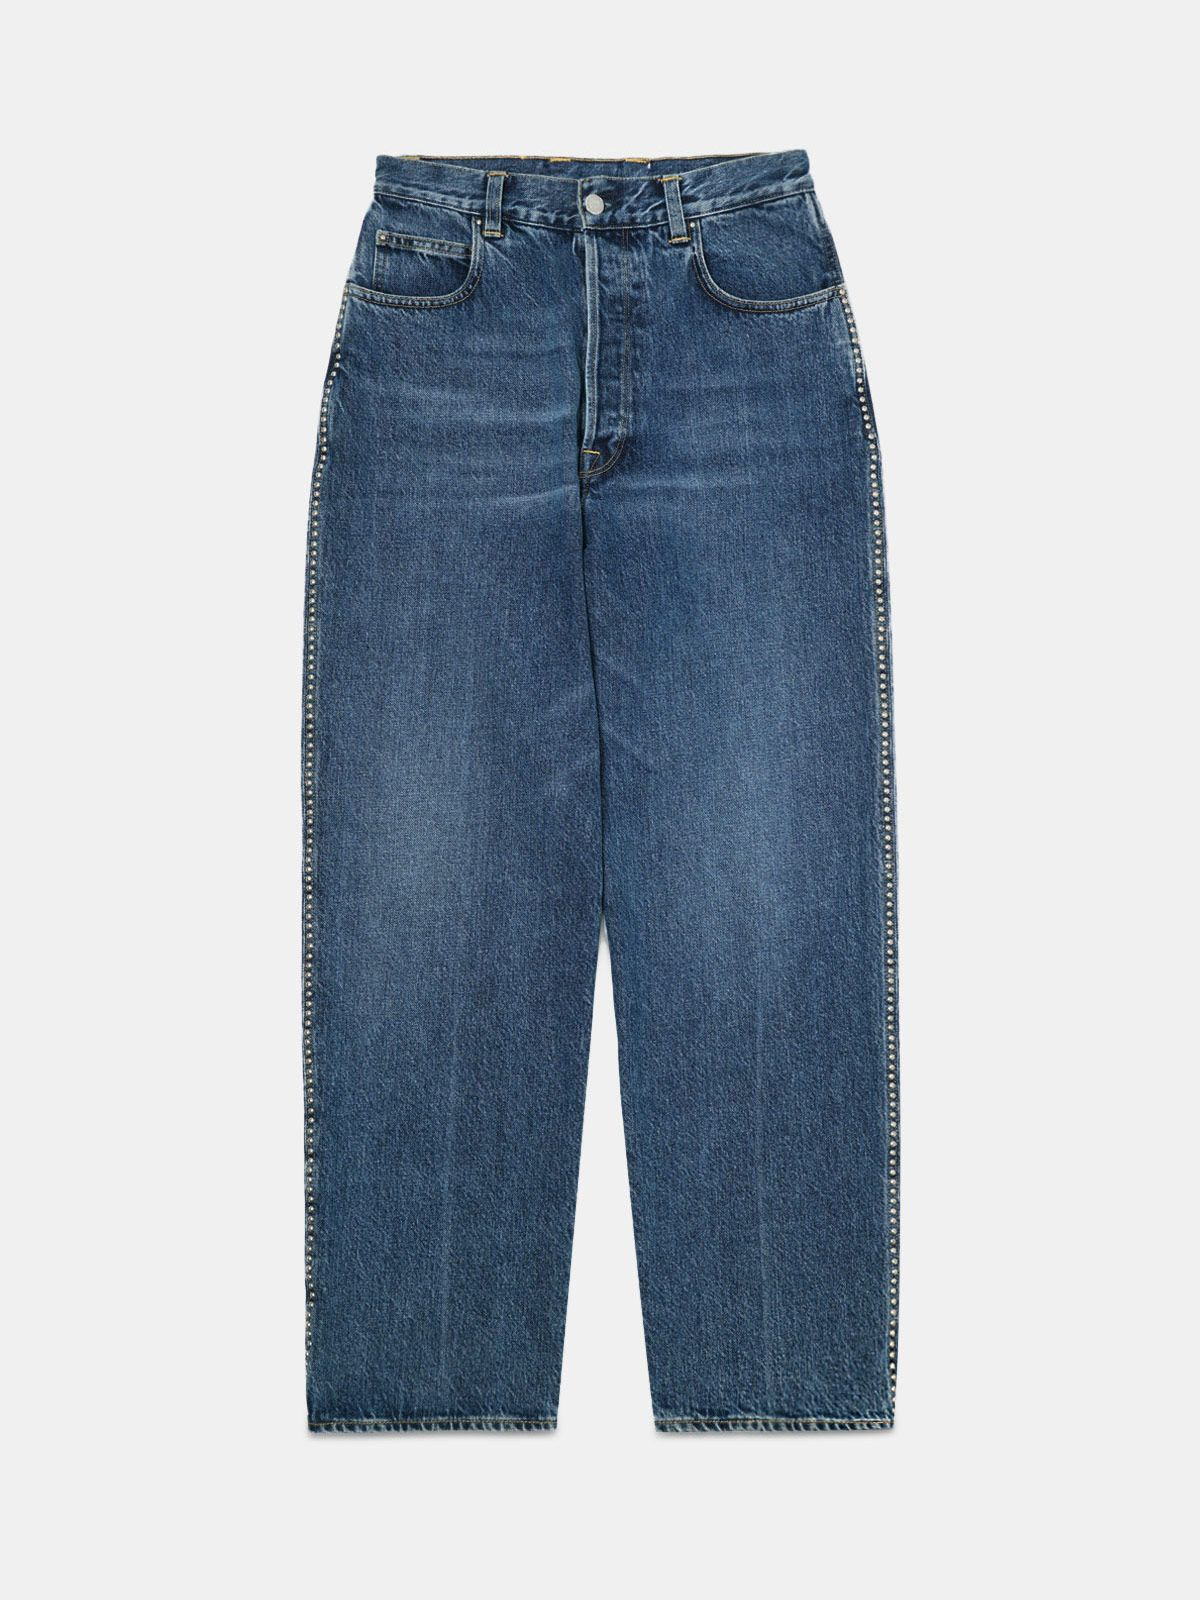 Golden Goose - Kim jeans in vintage effect mid wash denim in